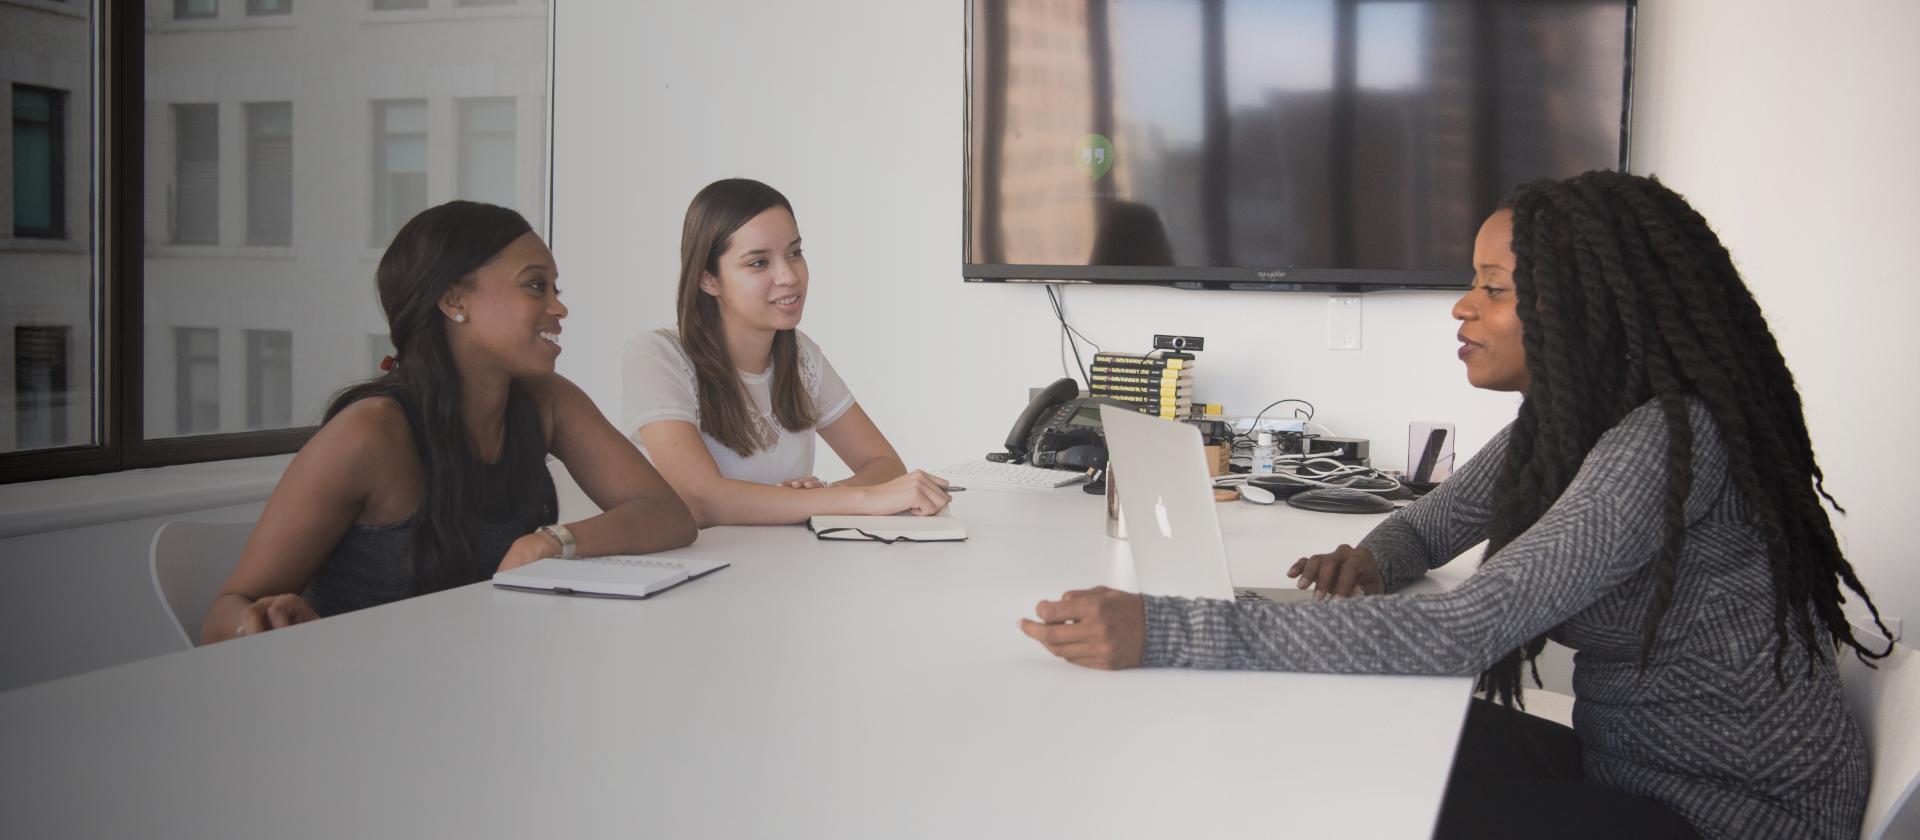 3 women having a meeting